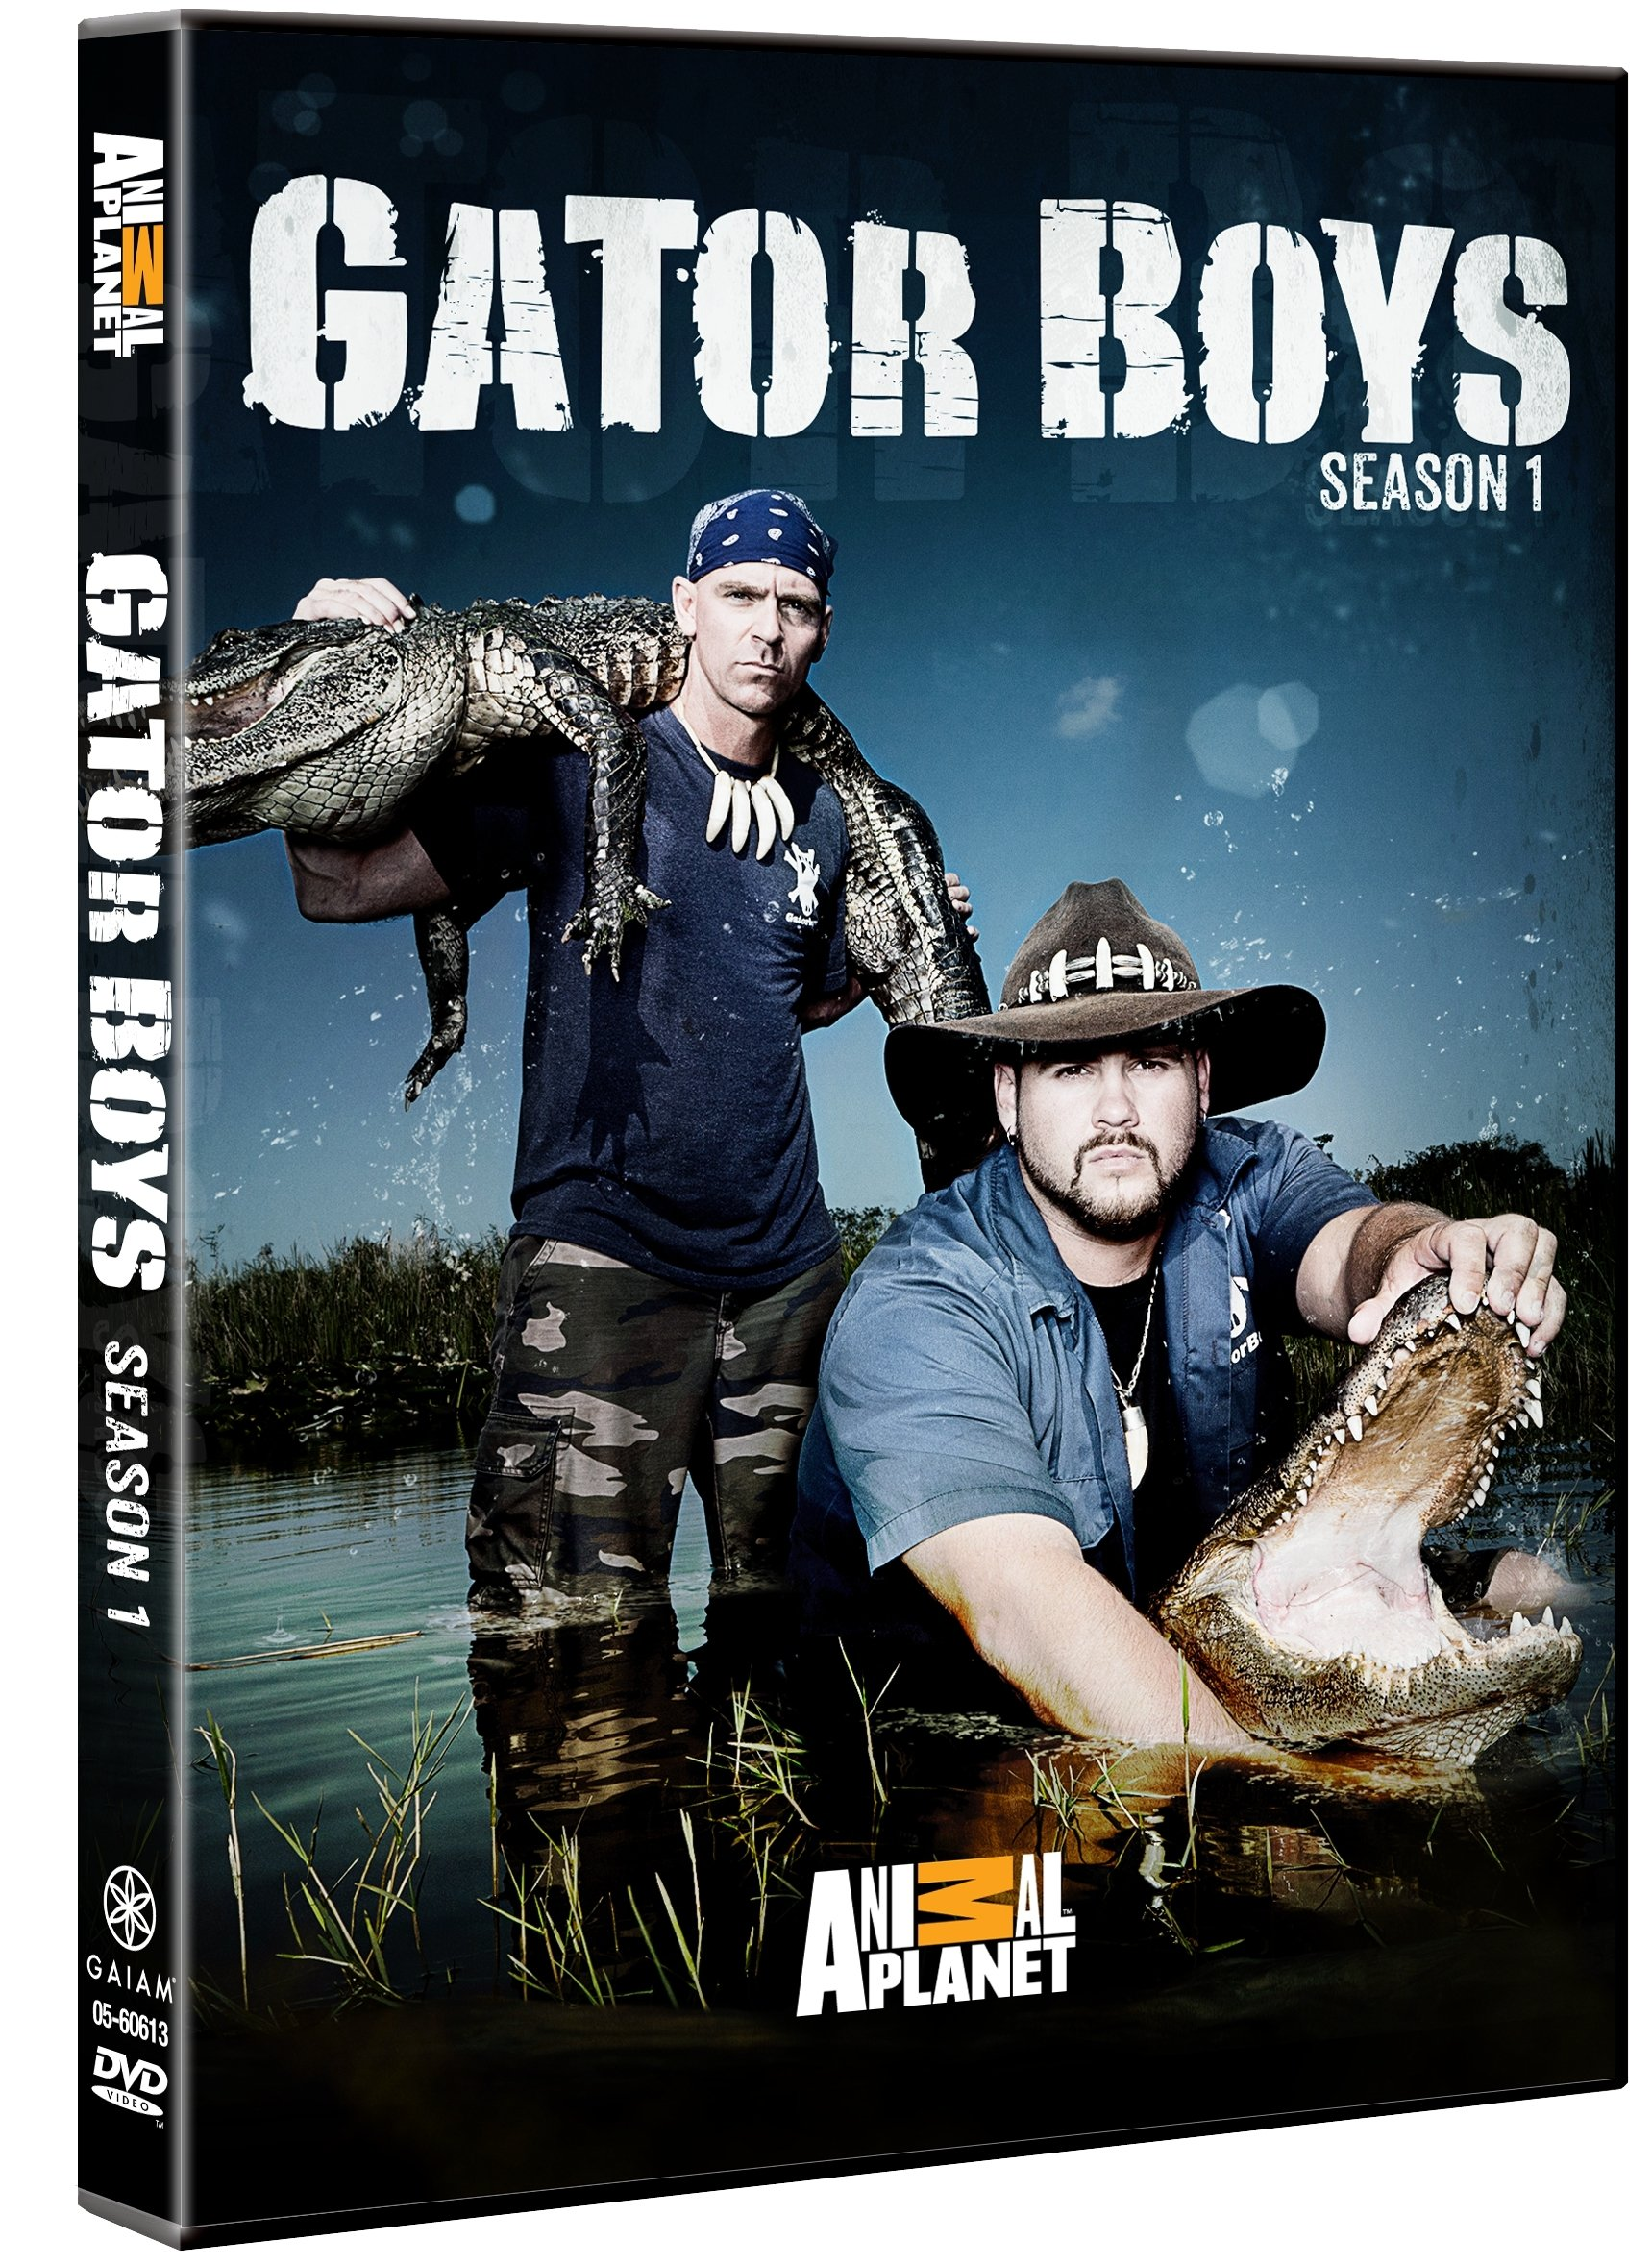 Gator Boys: Season 1 by CINEDIGM - UNI DIST CORP